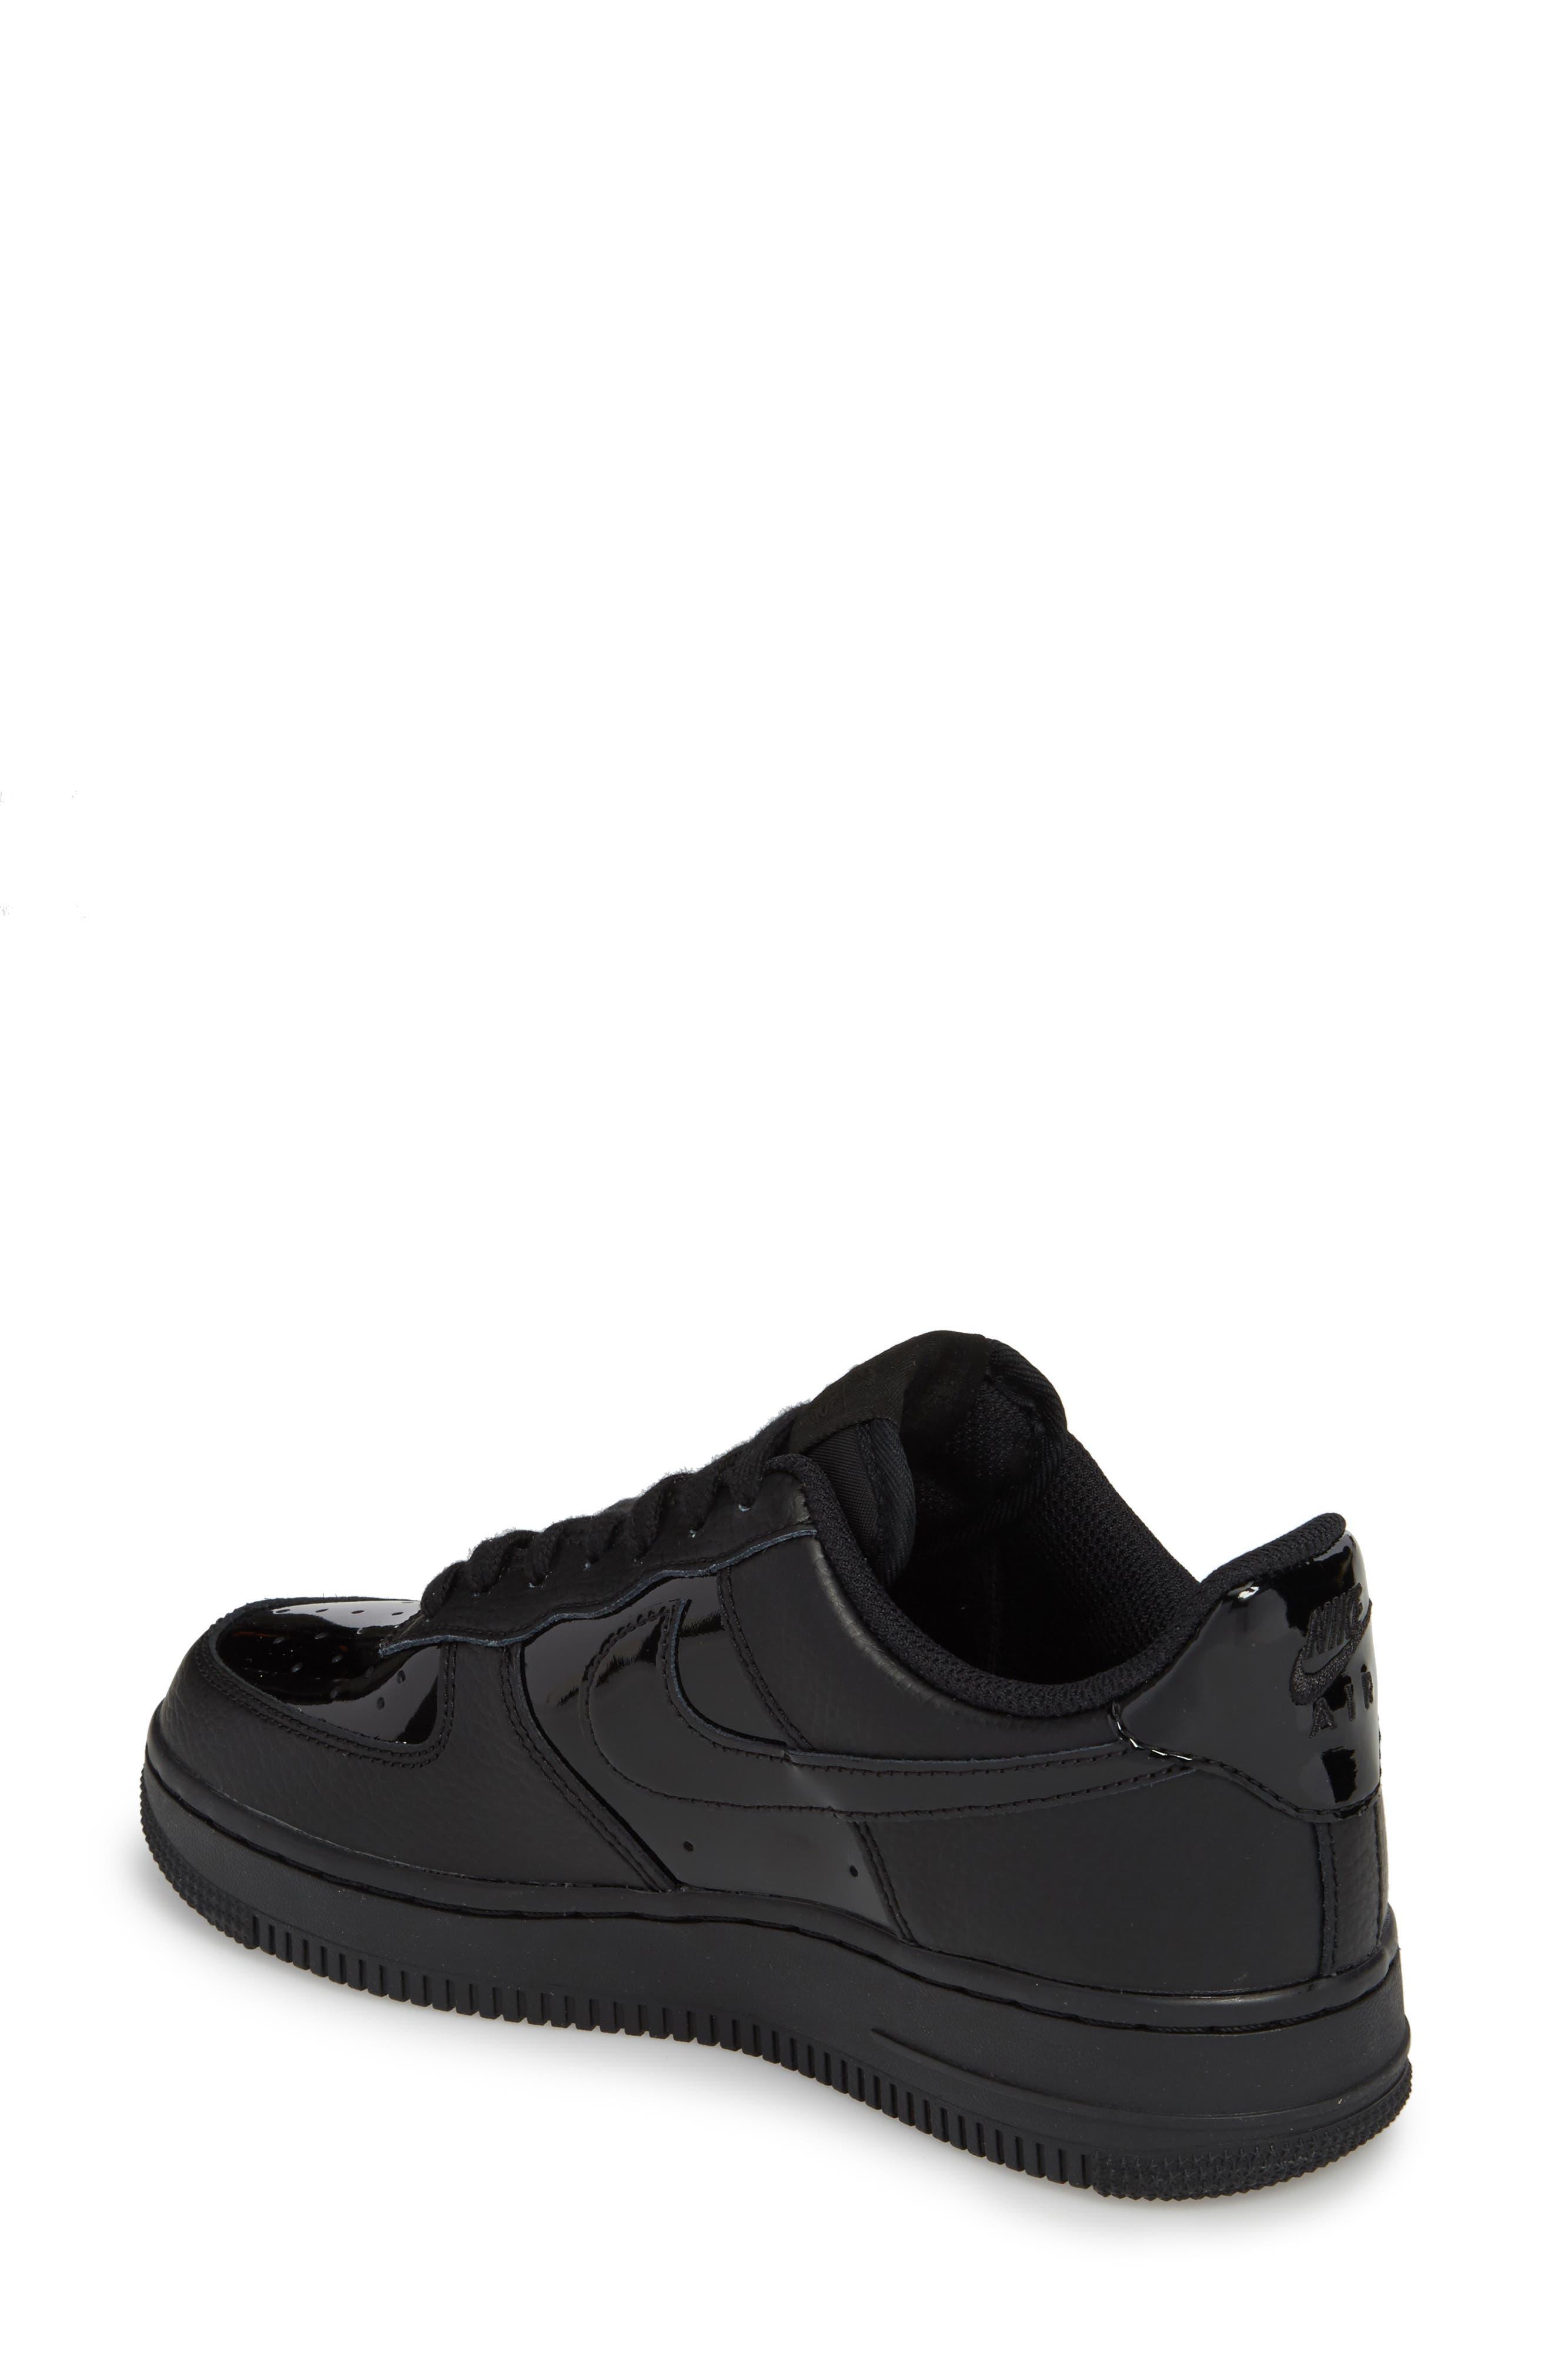 Alternate Image 2  - Nike Air Force 1 '07 Patent Sneaker (Women)